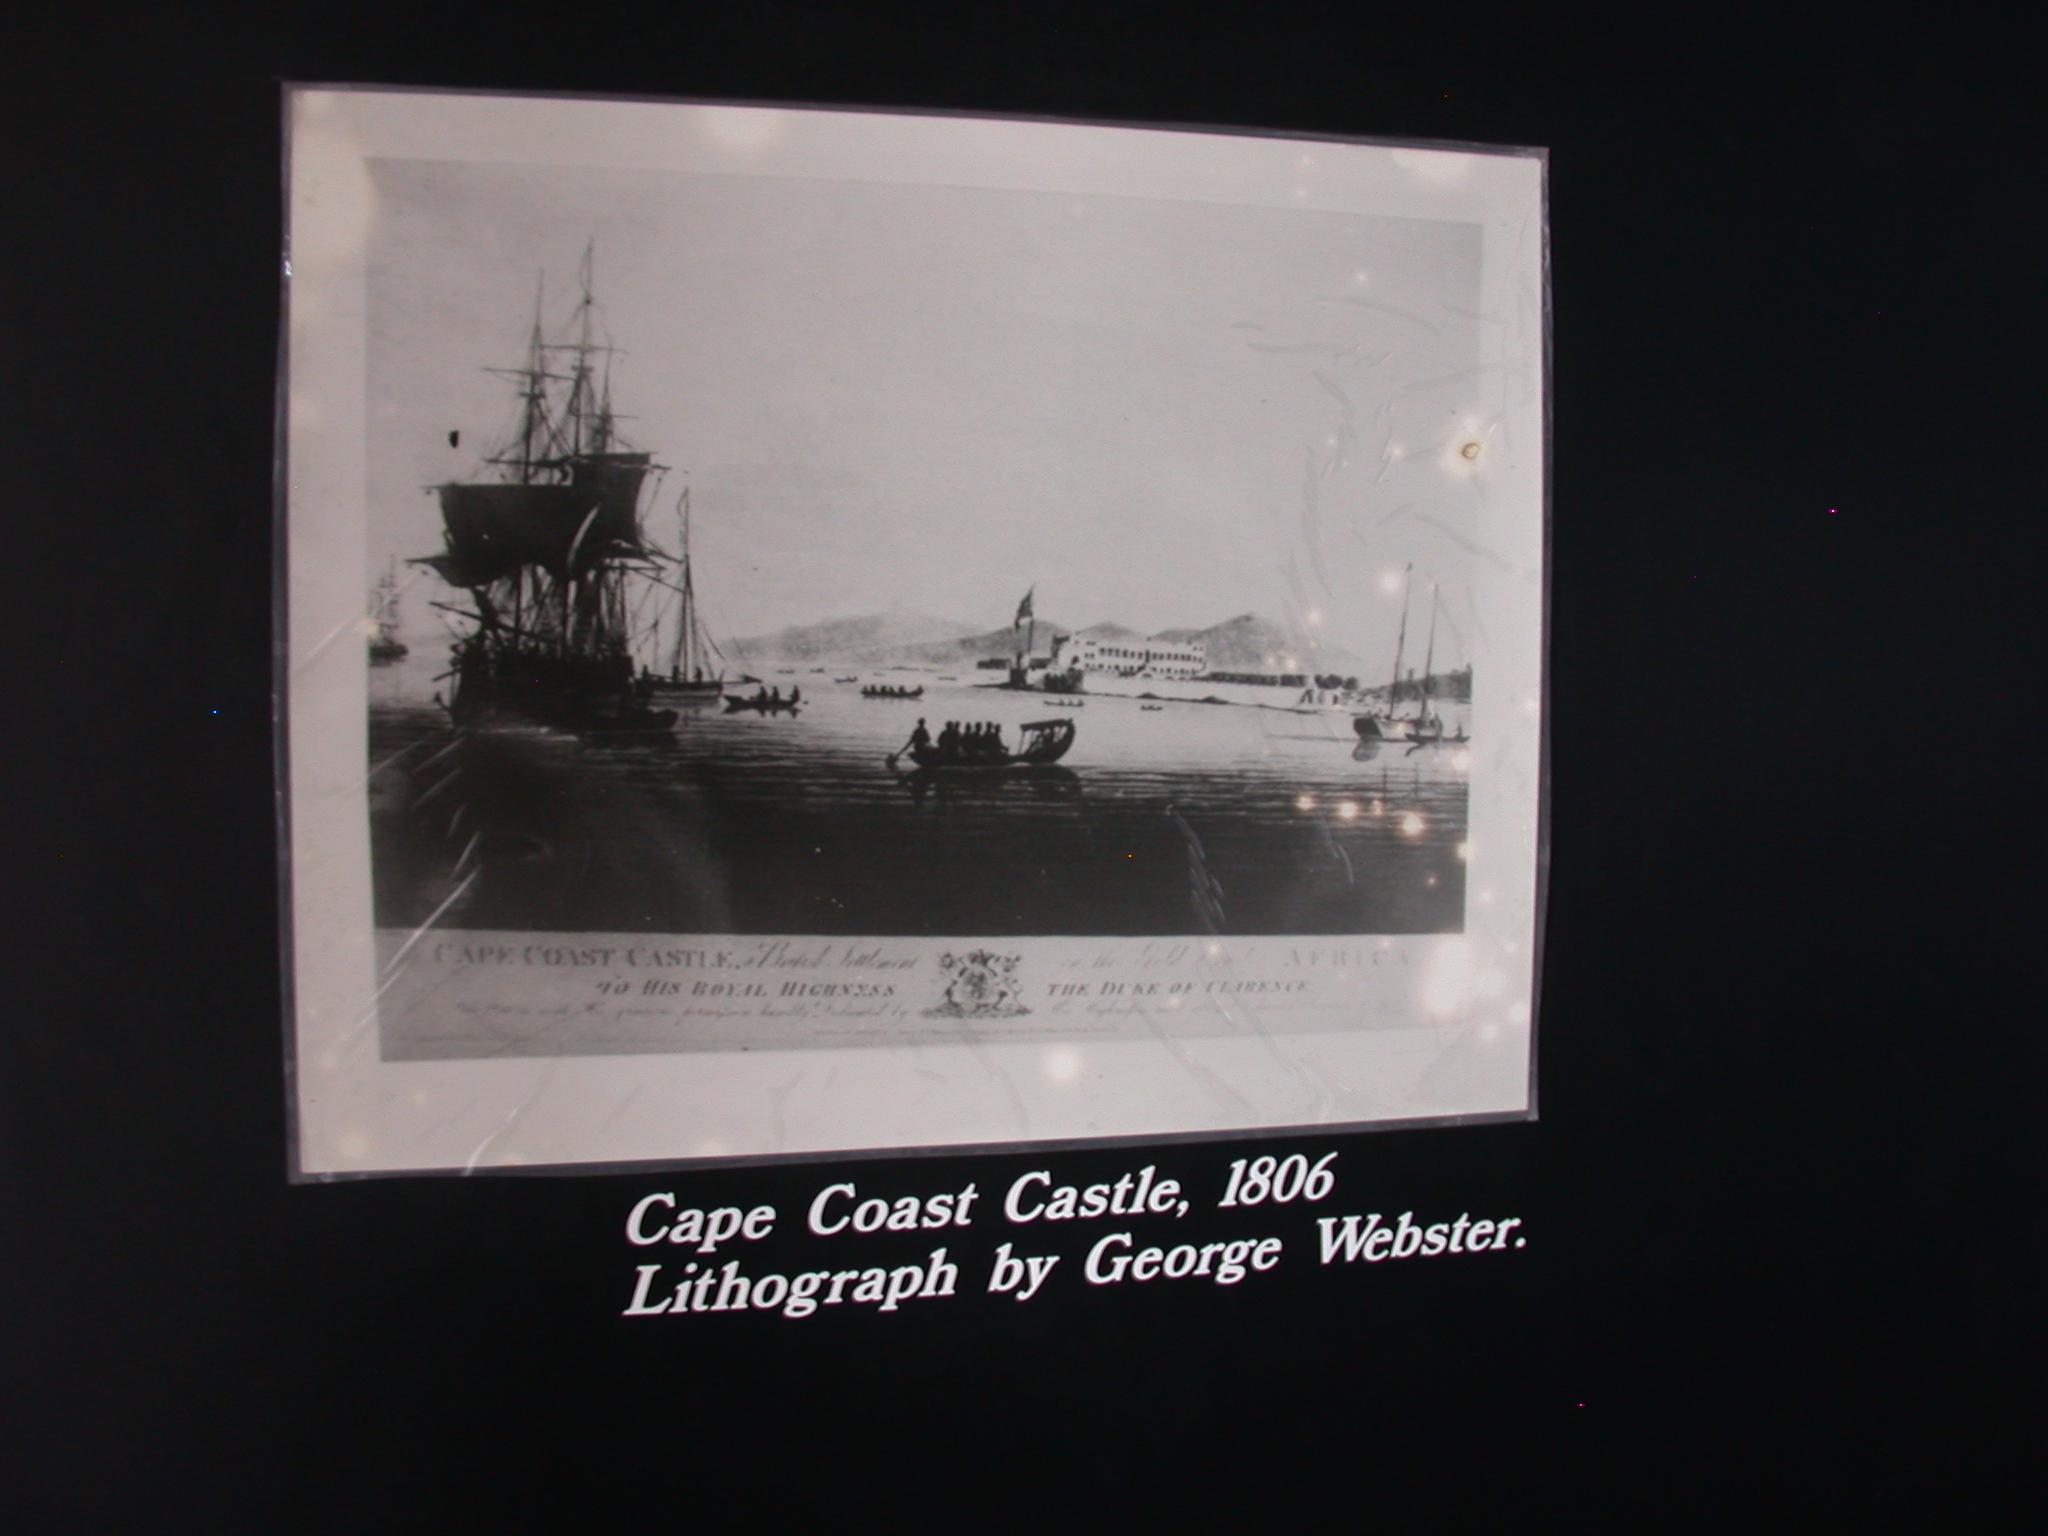 Lithograph of Cape Coast Castle, Cape Coast Slave Fort Museum, Cape Coast, Ghana